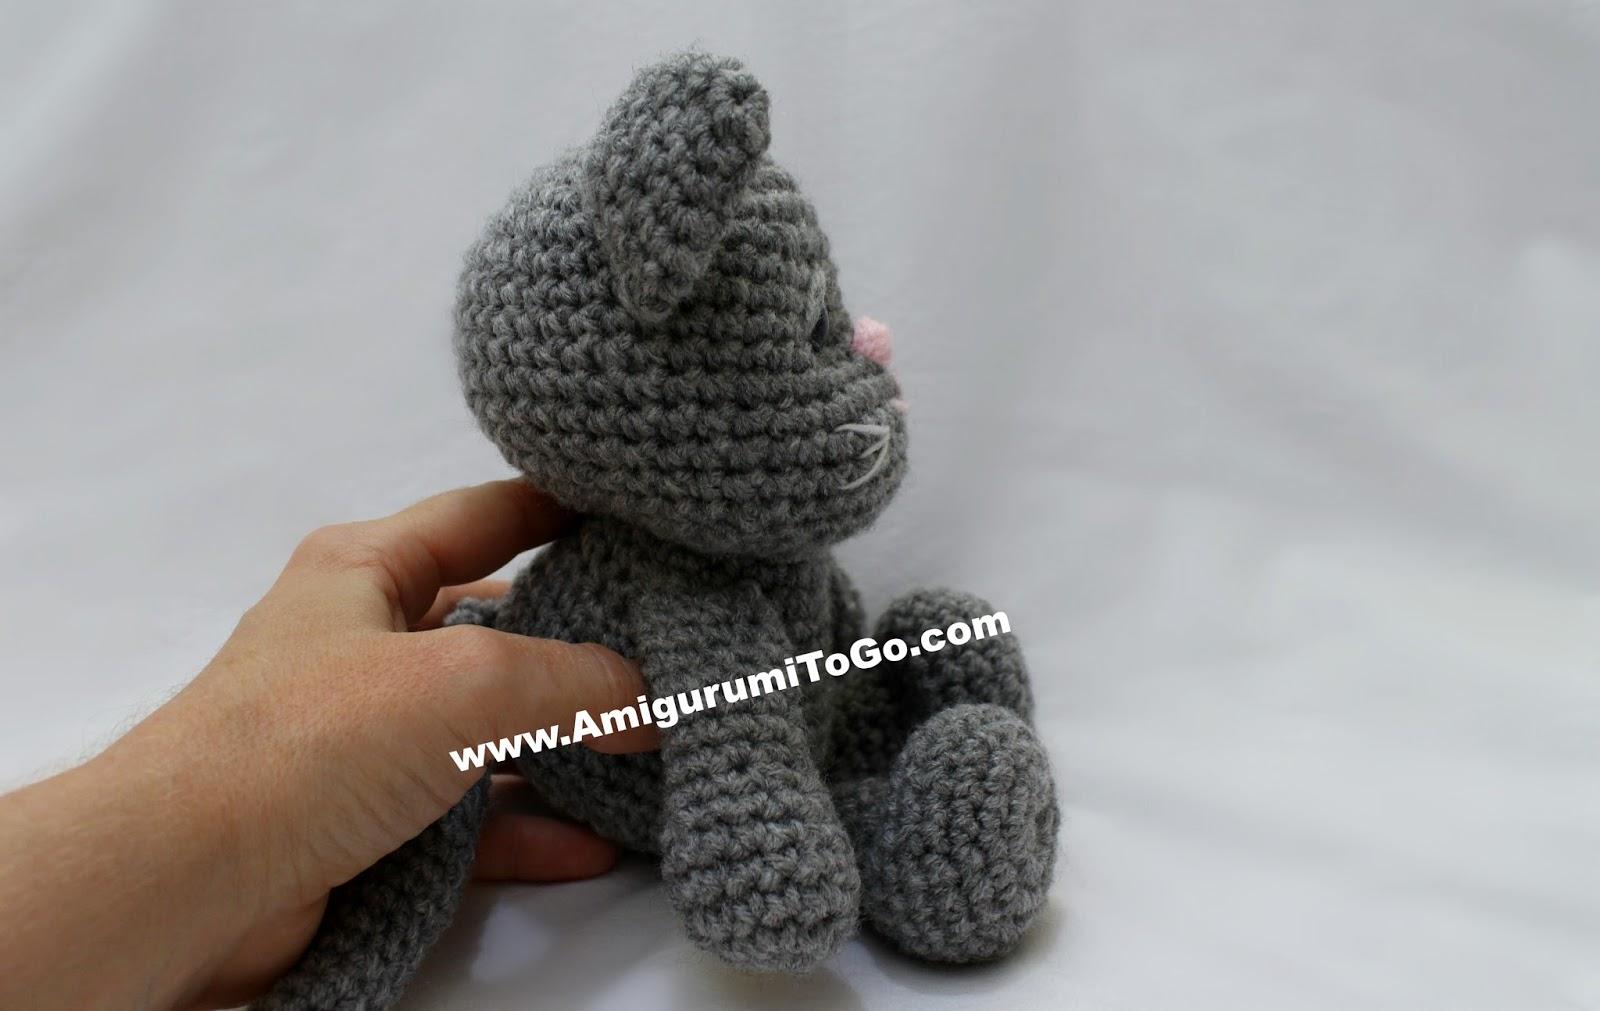 Amigurumi Cat Crochet Pattern Easy Video Tutorial | 1011x1600